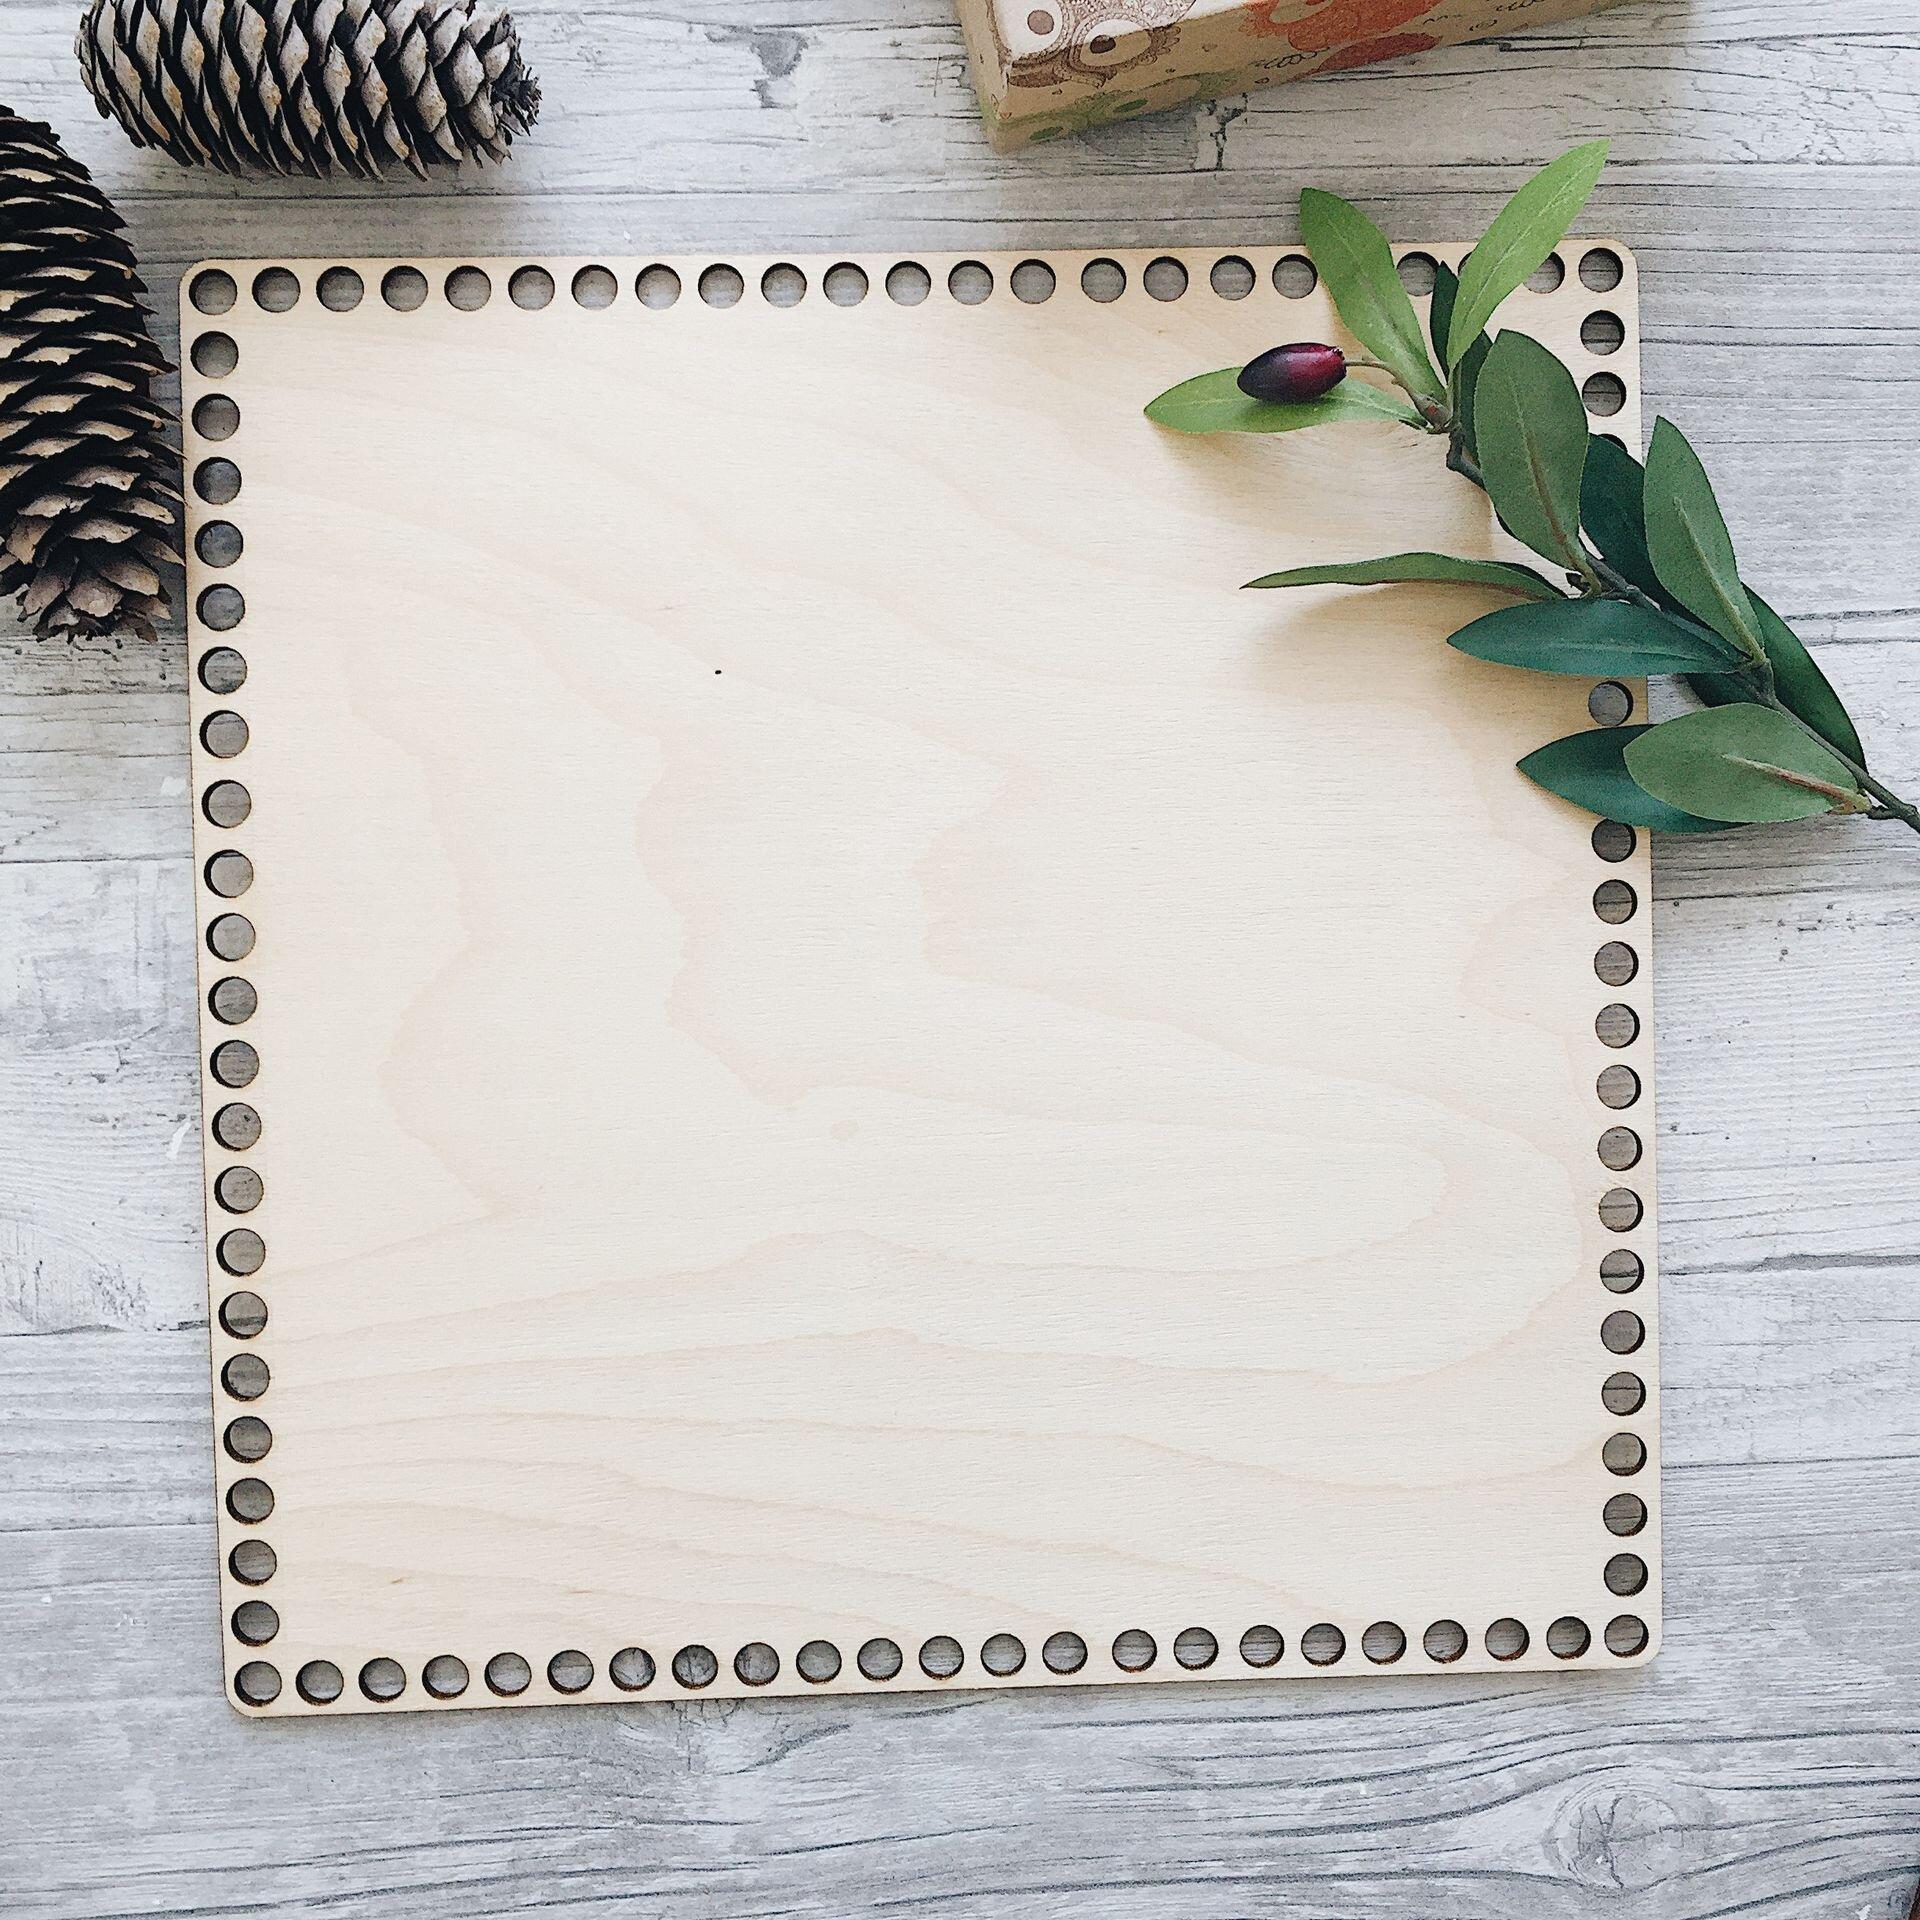 Деревянное донышко для вязания, квадрат 30см - фото pic_fe71418f45e6291_1920x9000_1.jpg